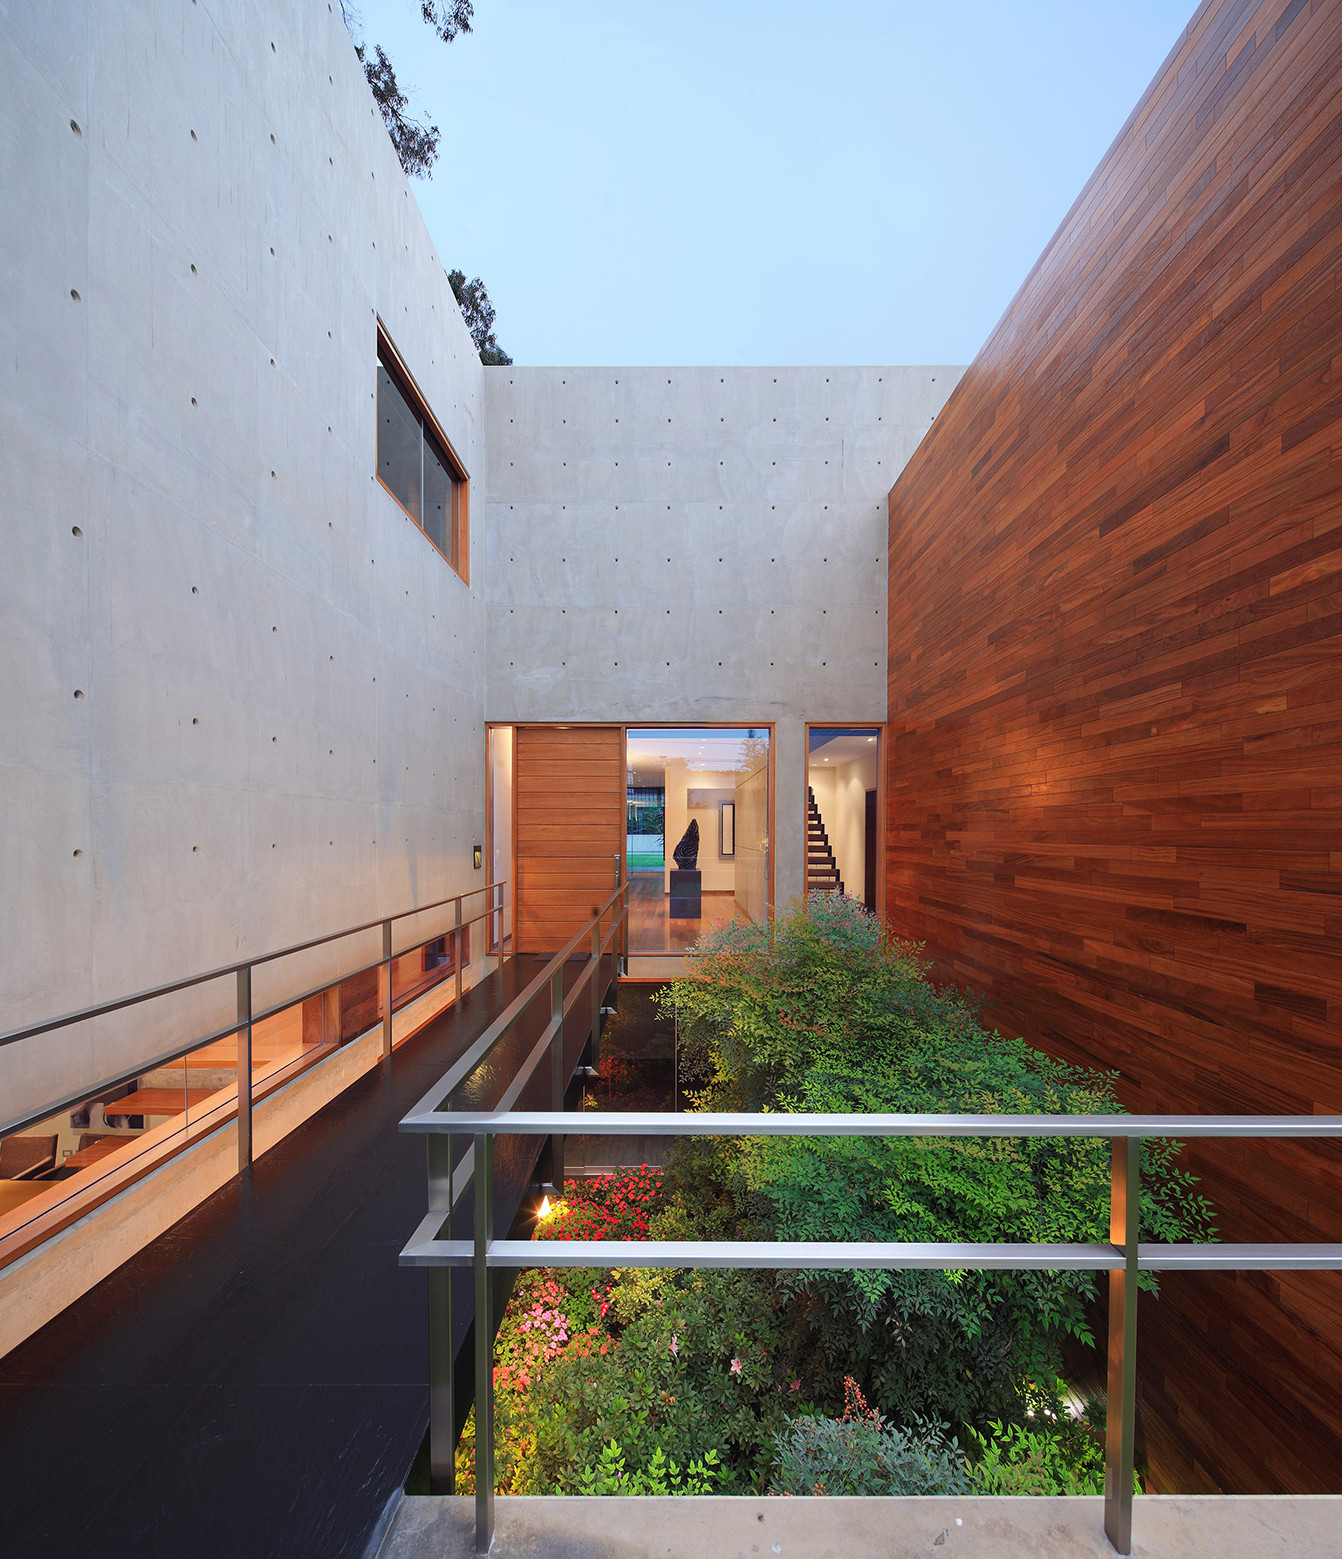 House H / Jaime Ortiz de Zevallos